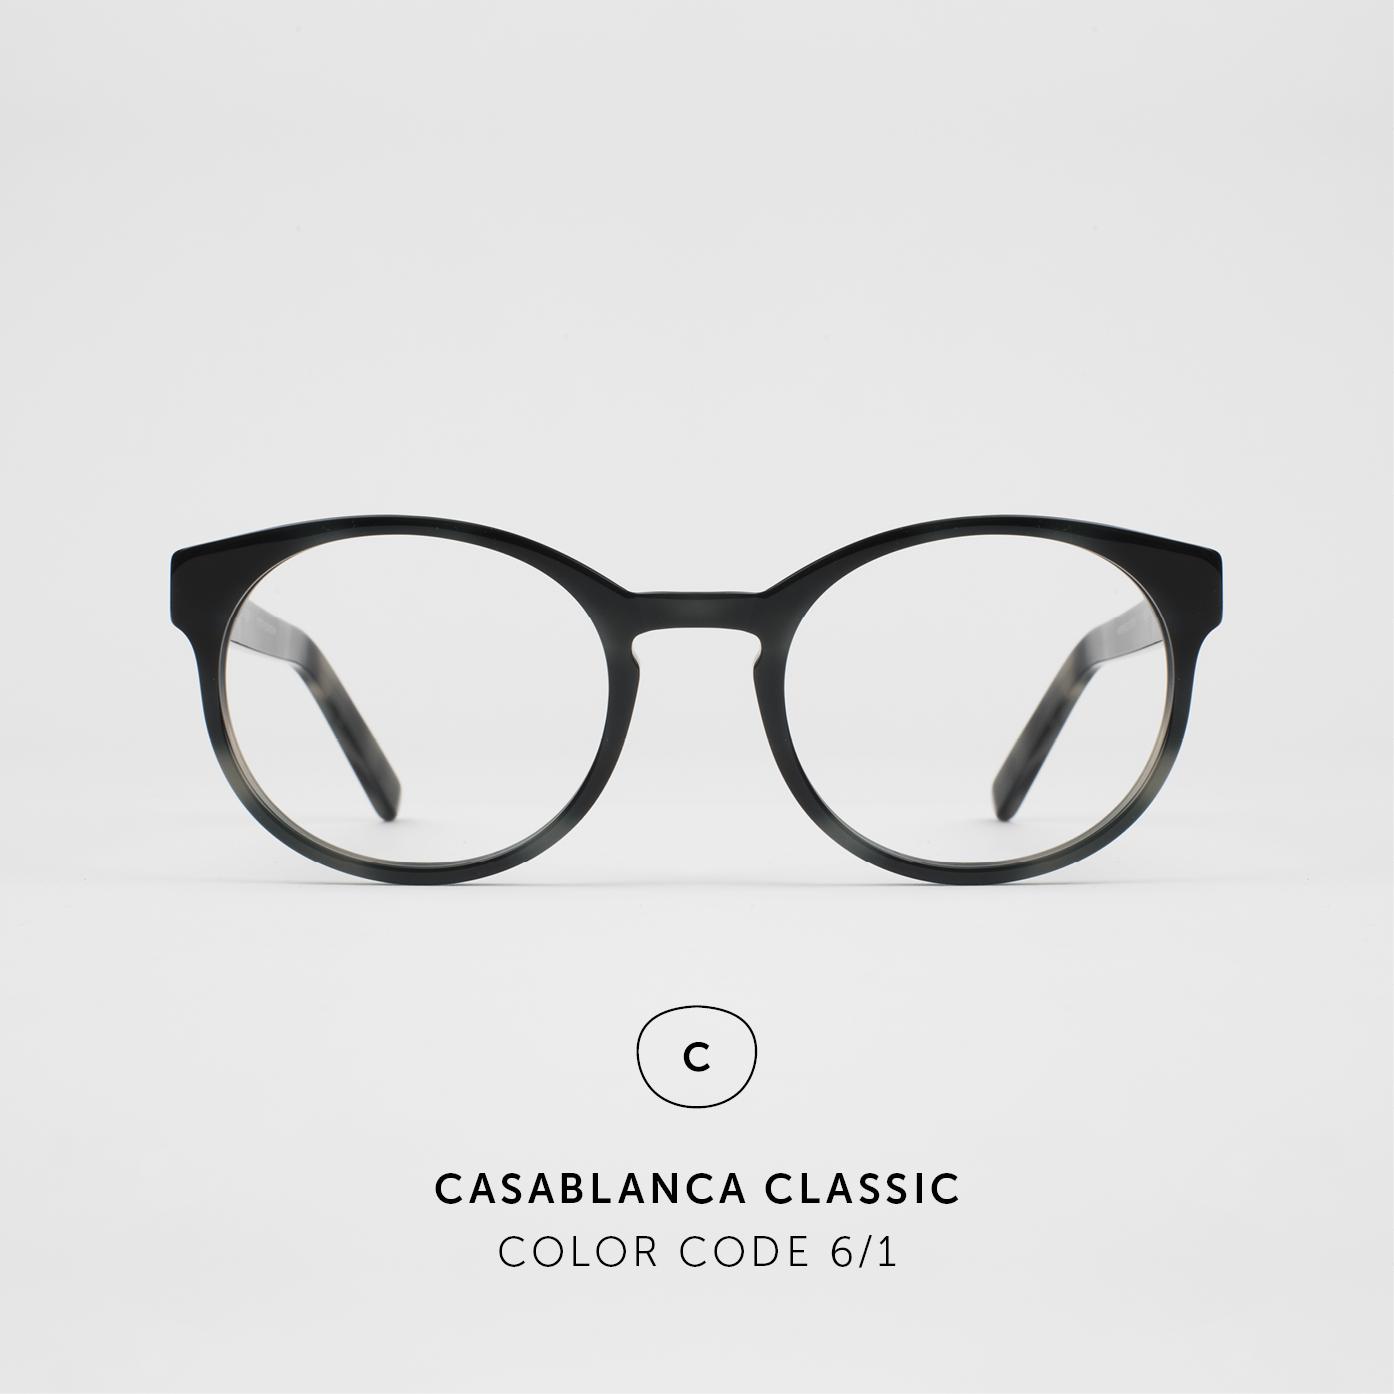 CasablancaClassic25.jpg